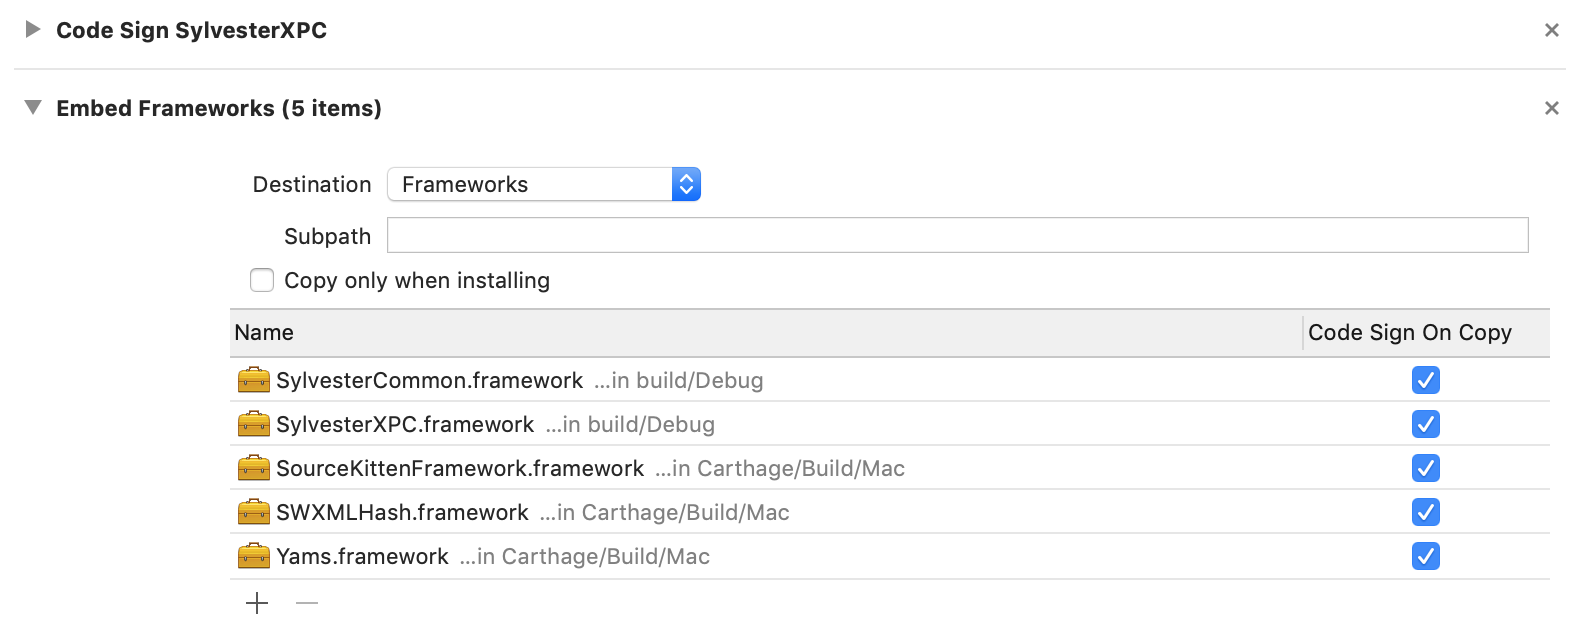 Embed Frameworks Phase